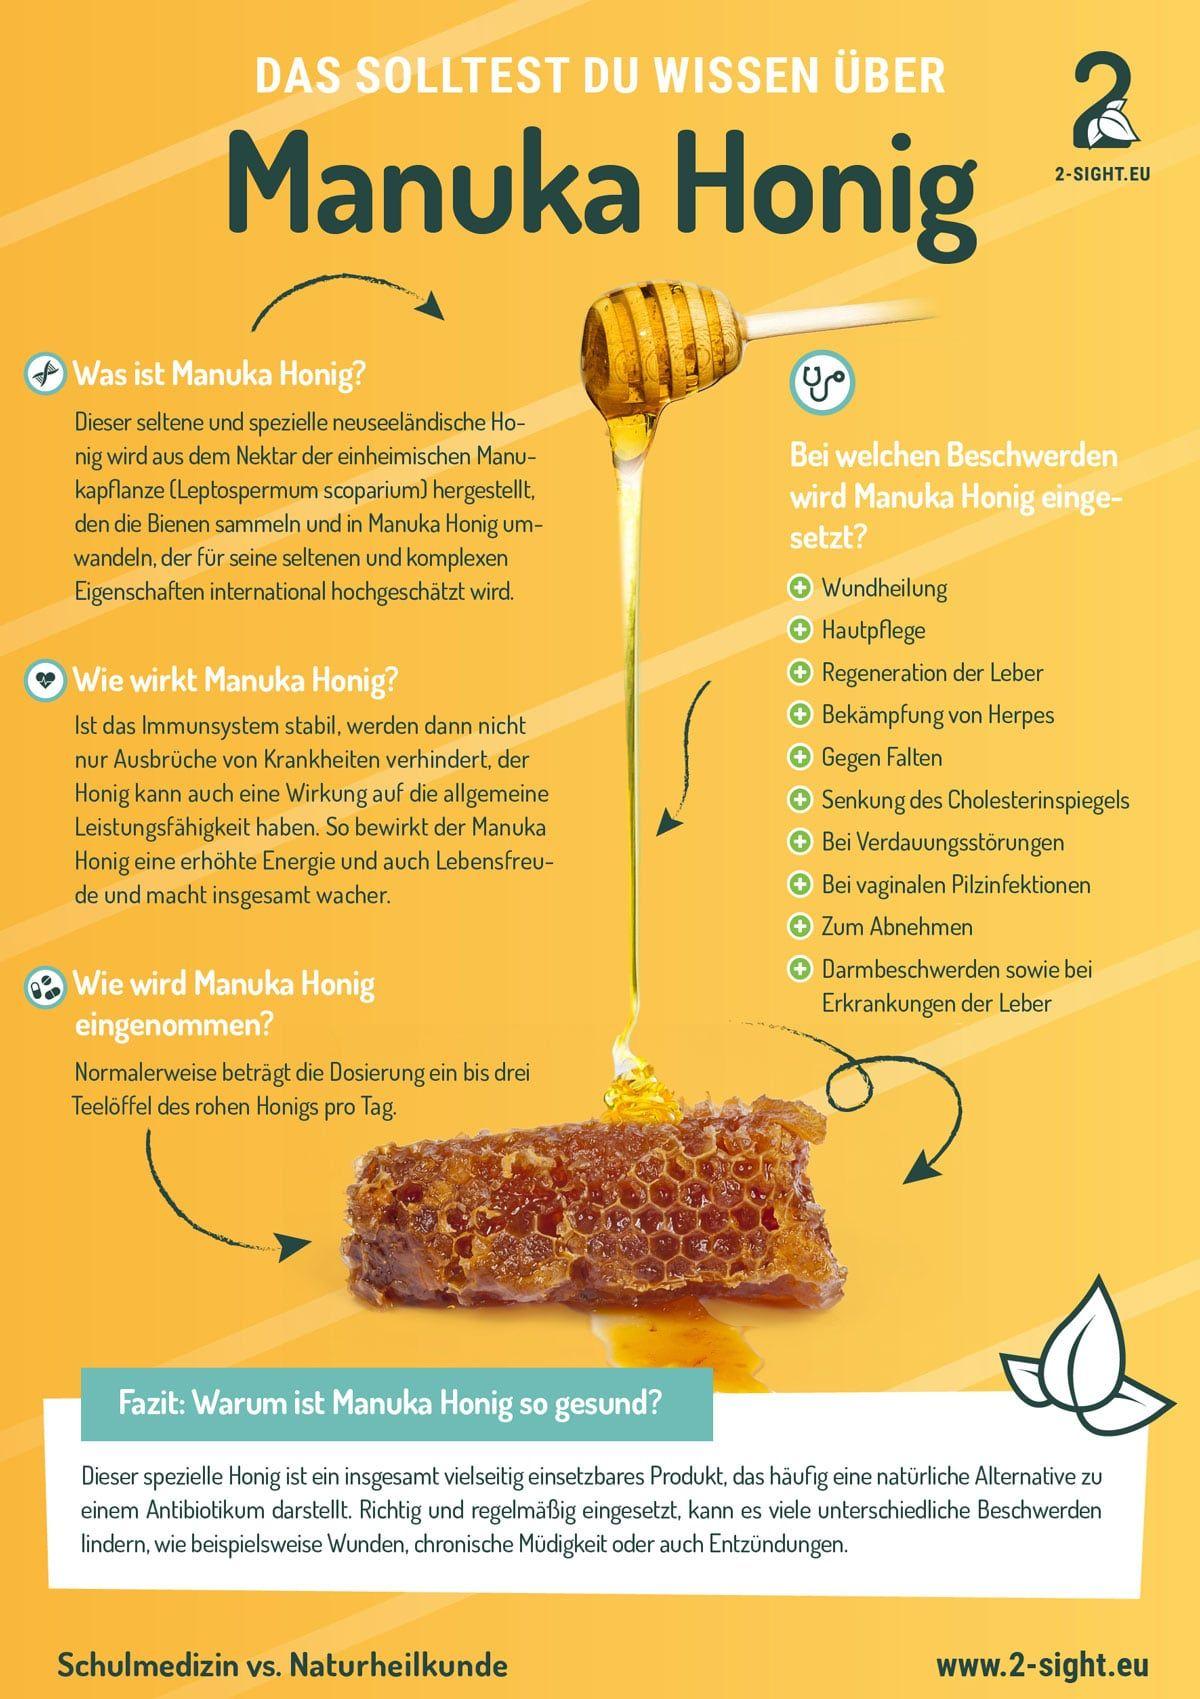 Manuka Honig Ratgeber Tipps Tricks Produktempfehlung Manuka Honig Honig Lebensmittel Essen